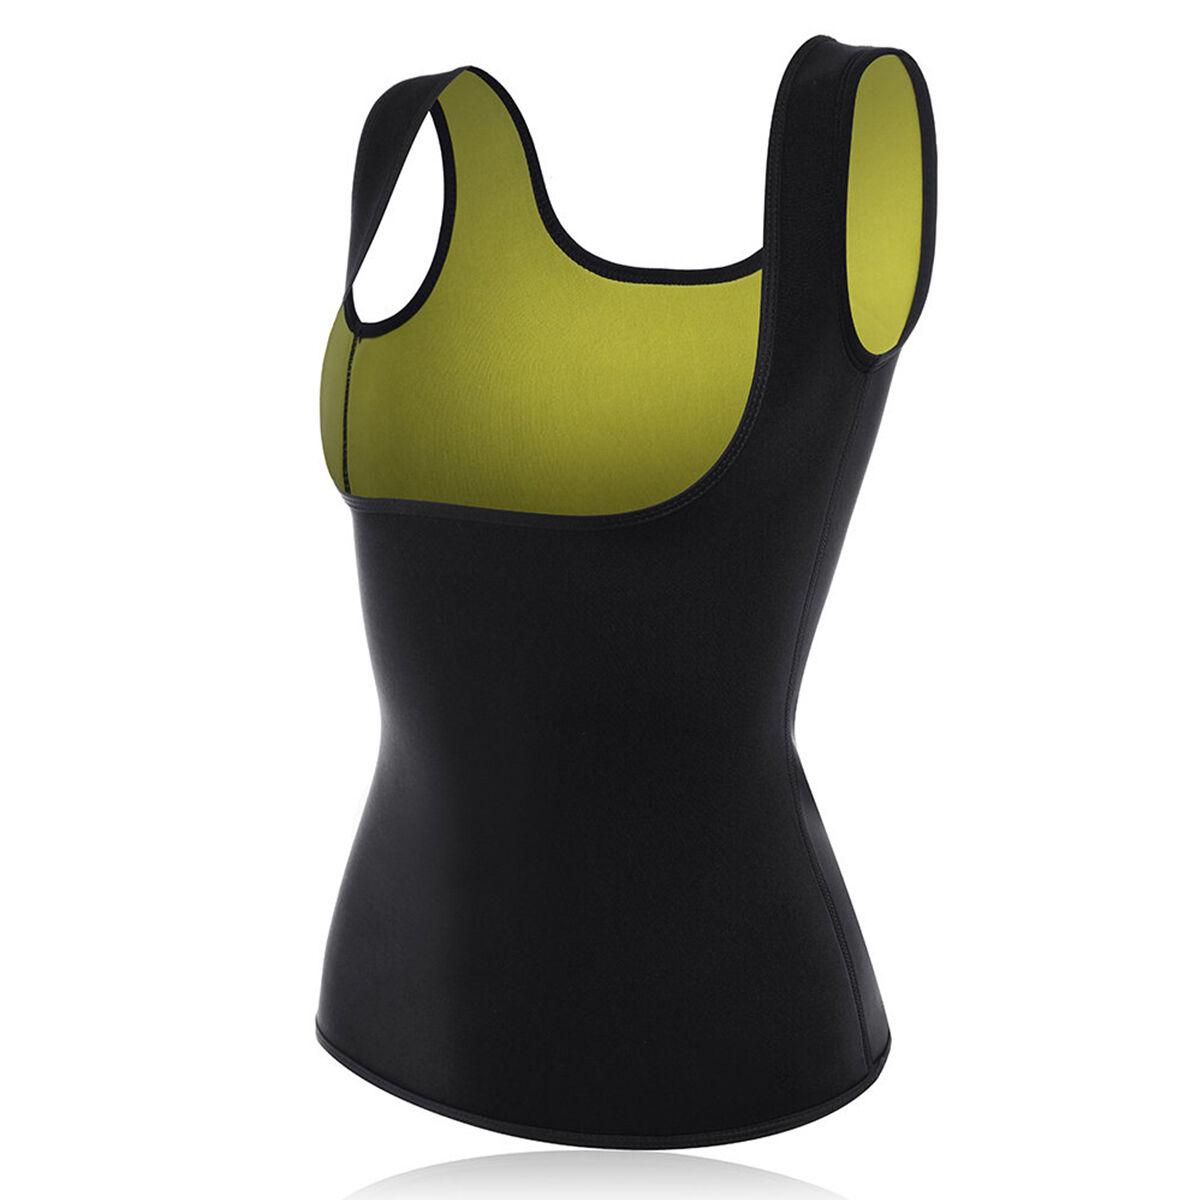 61f3084bab Women Slimming Vest Body Shaper Hot Thermo Sweat Neoprene Waist Trainer  Slimmer Corset COD